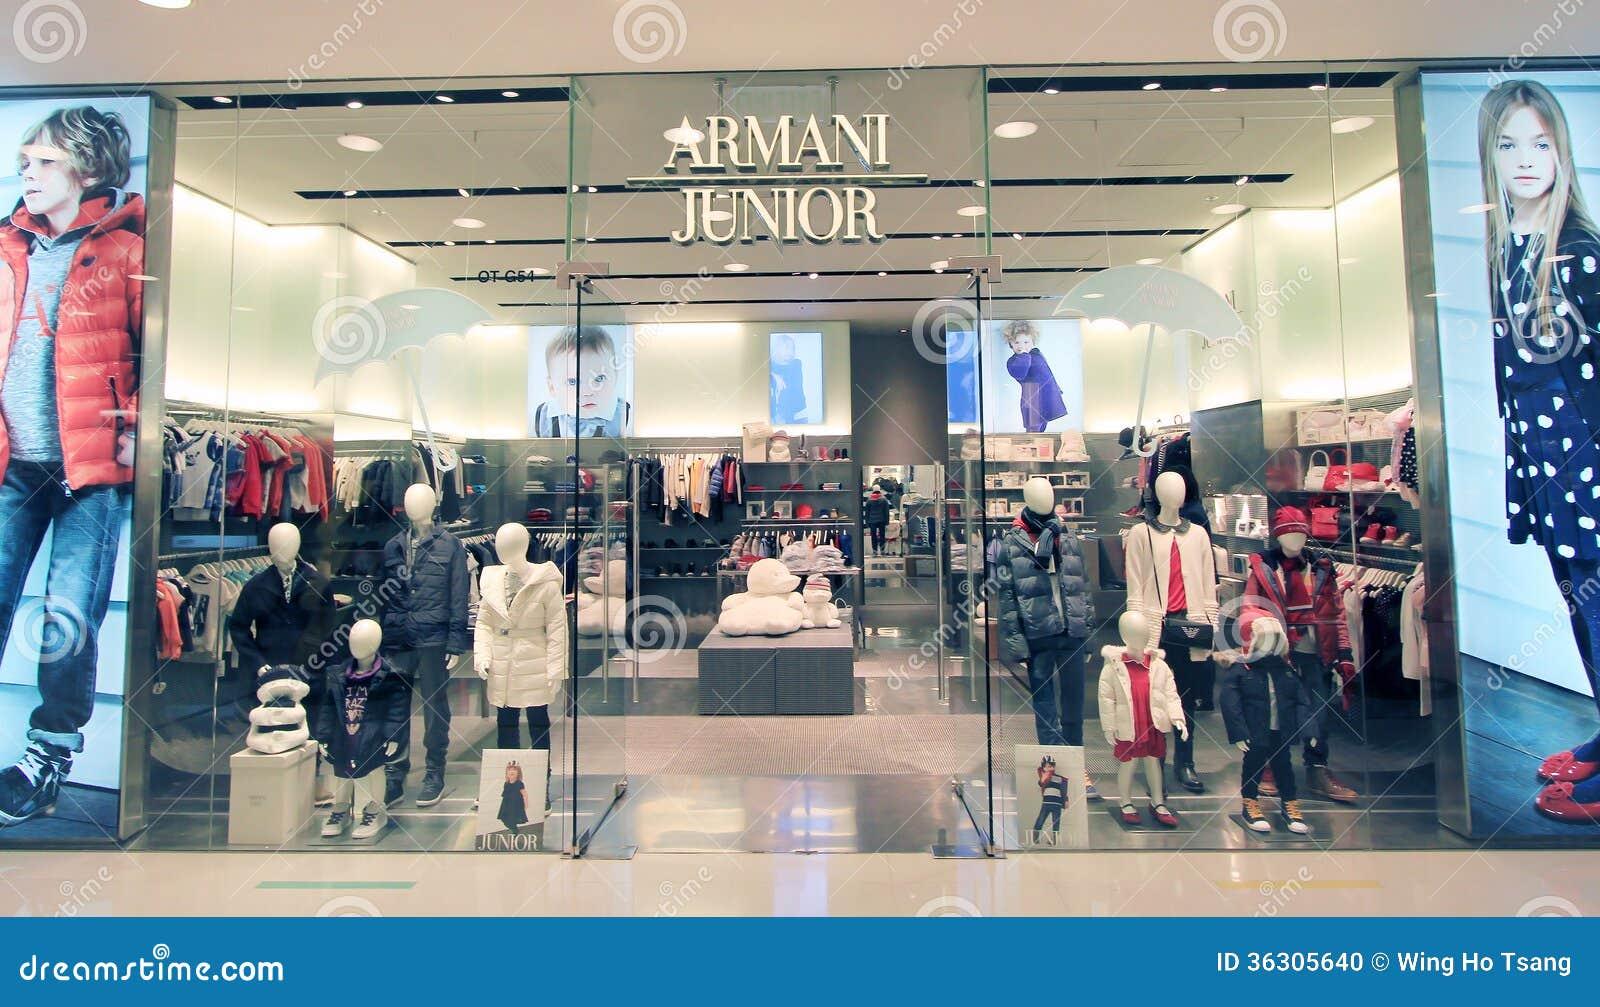 Shop Junior Clothing